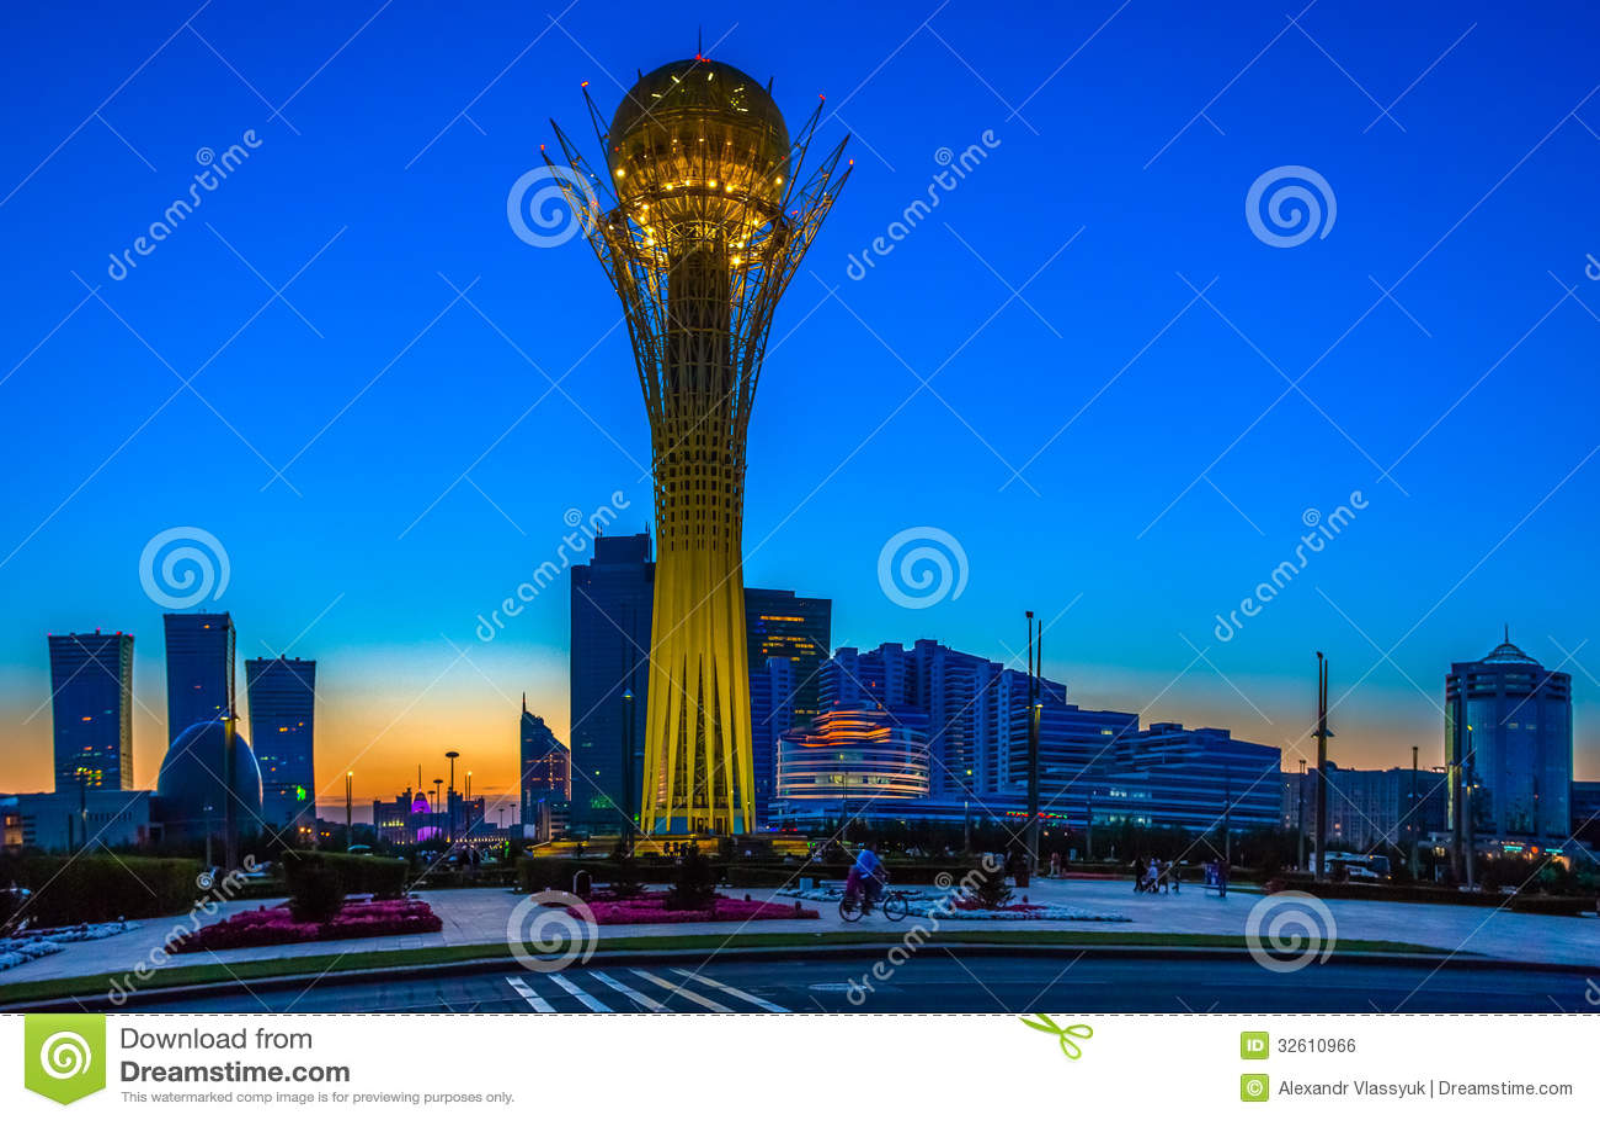 Astana, Kazakhstan - 24 August: The symbol of Kazakhstan Baytirek view of backlit at sunset, August 24, 2012, Astana, Kazakhstan